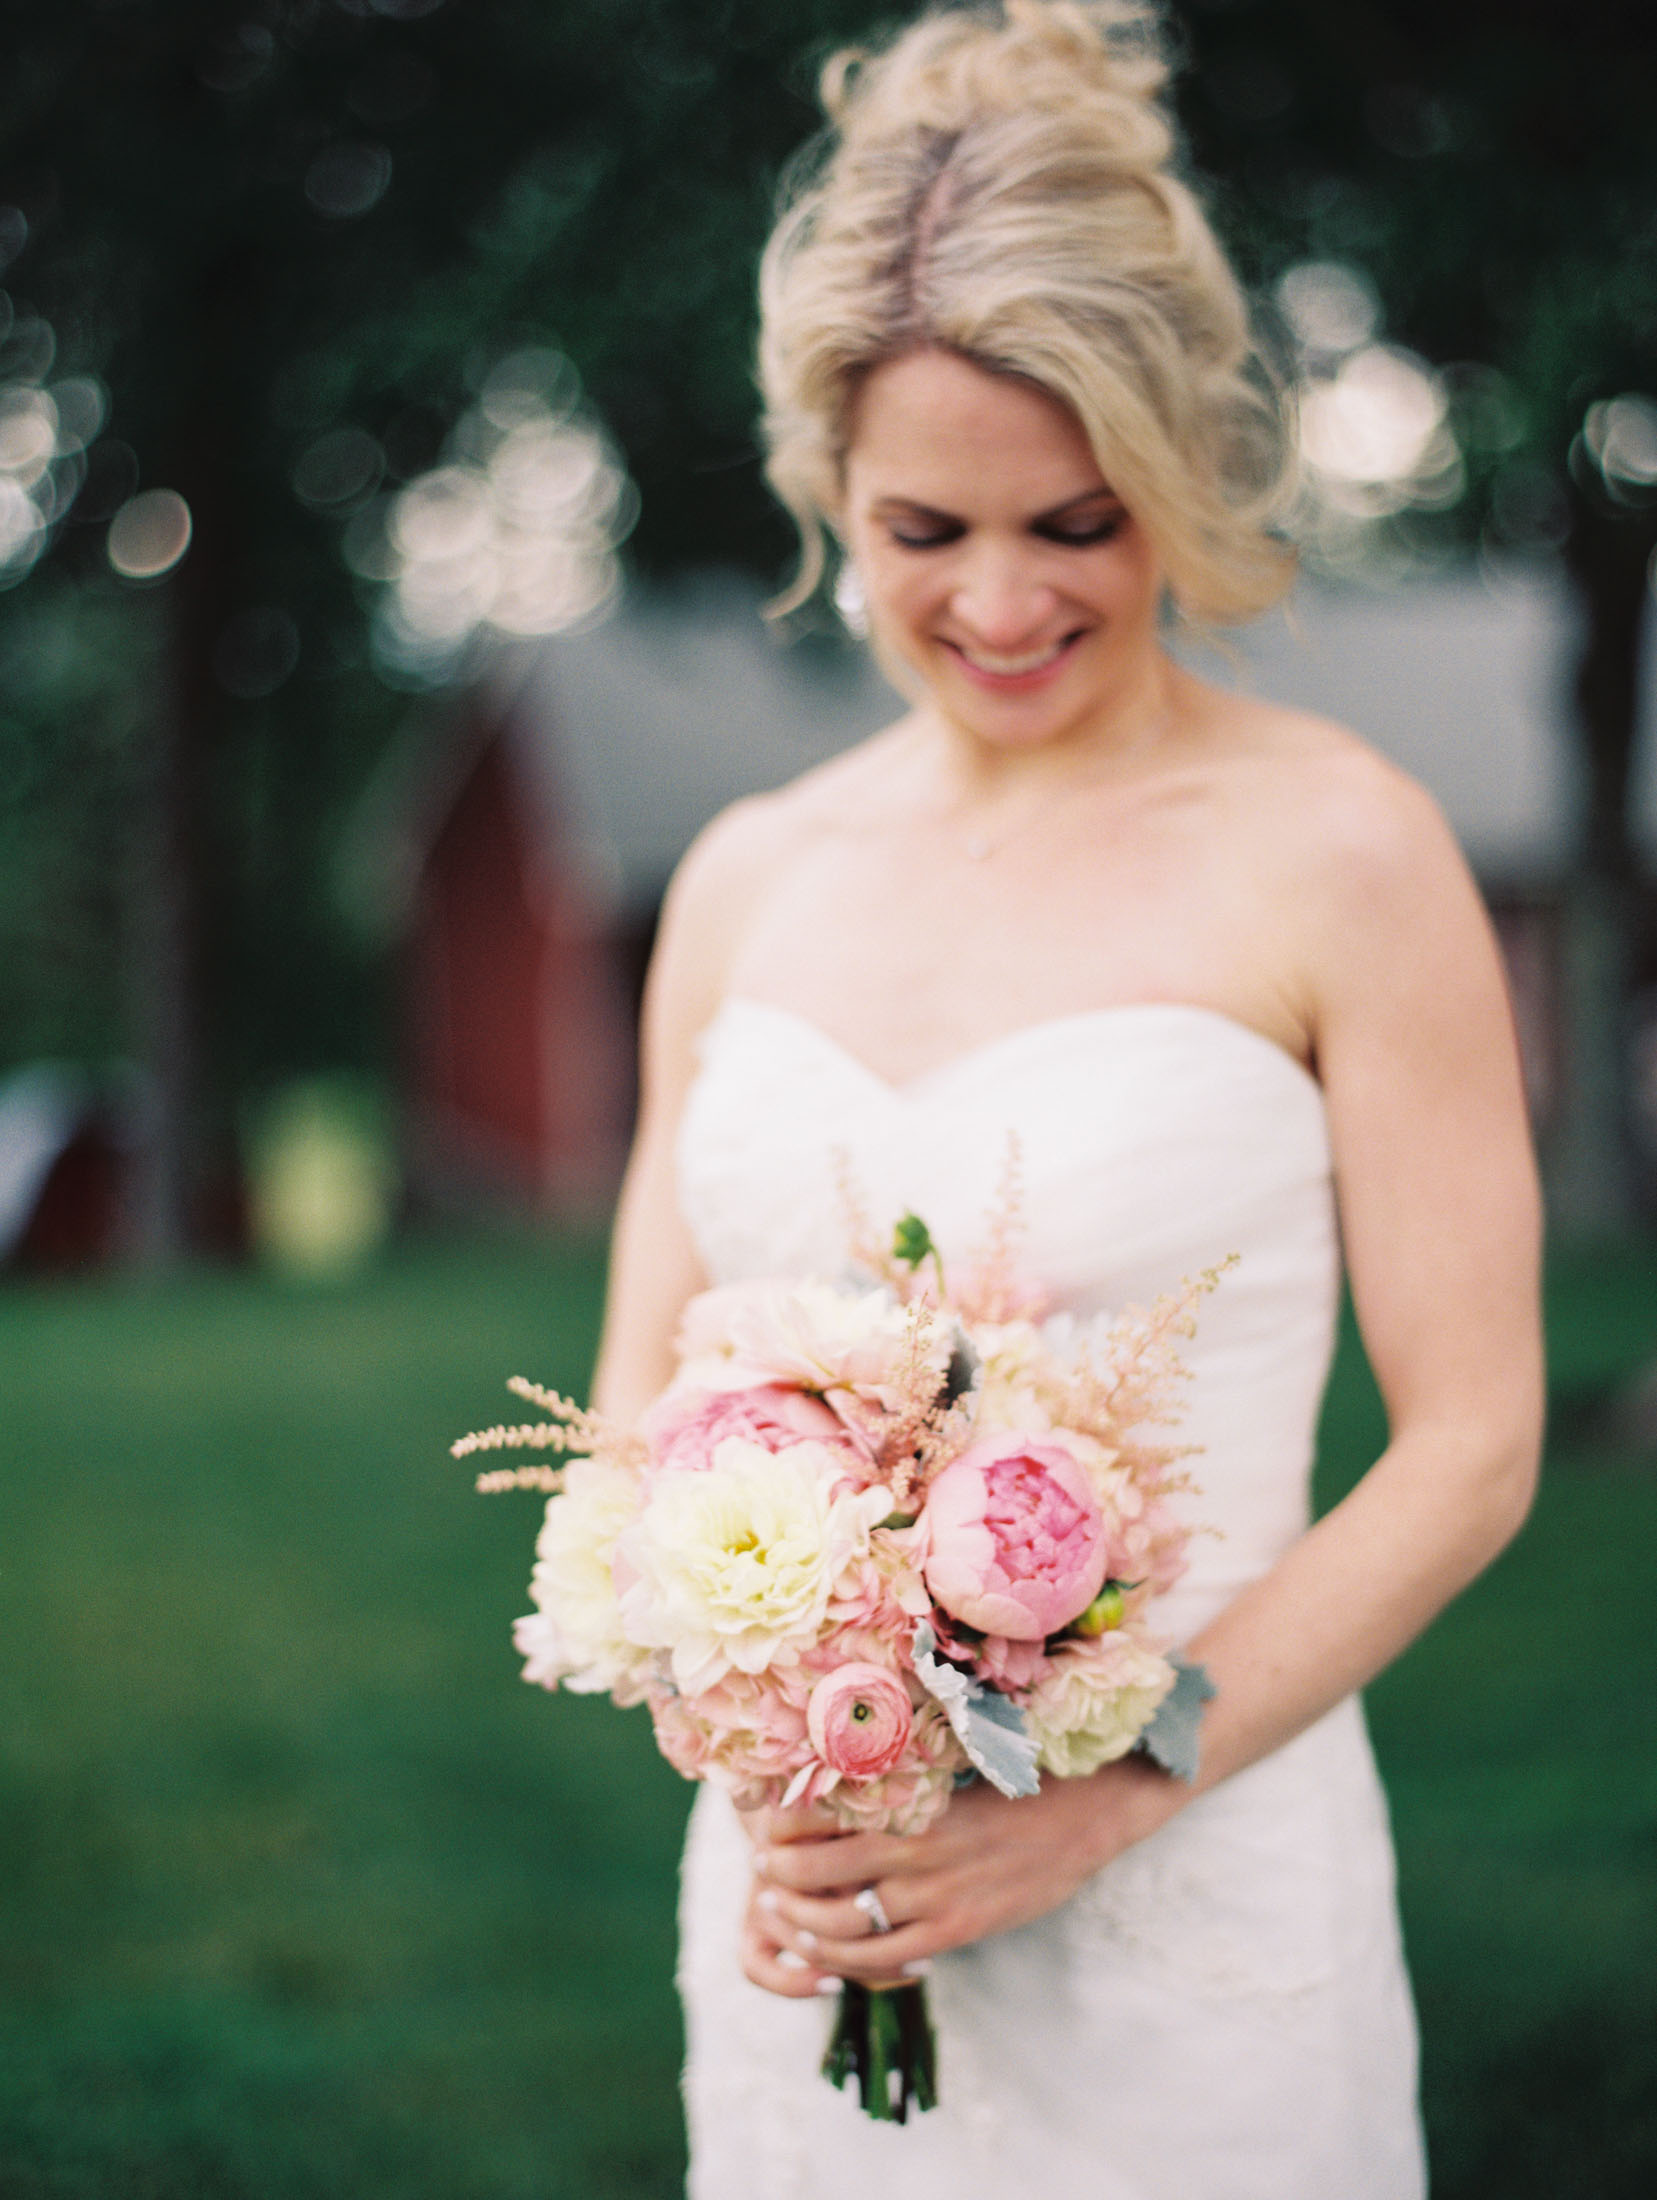 Blissful-Meadows-wedding-16.jpg